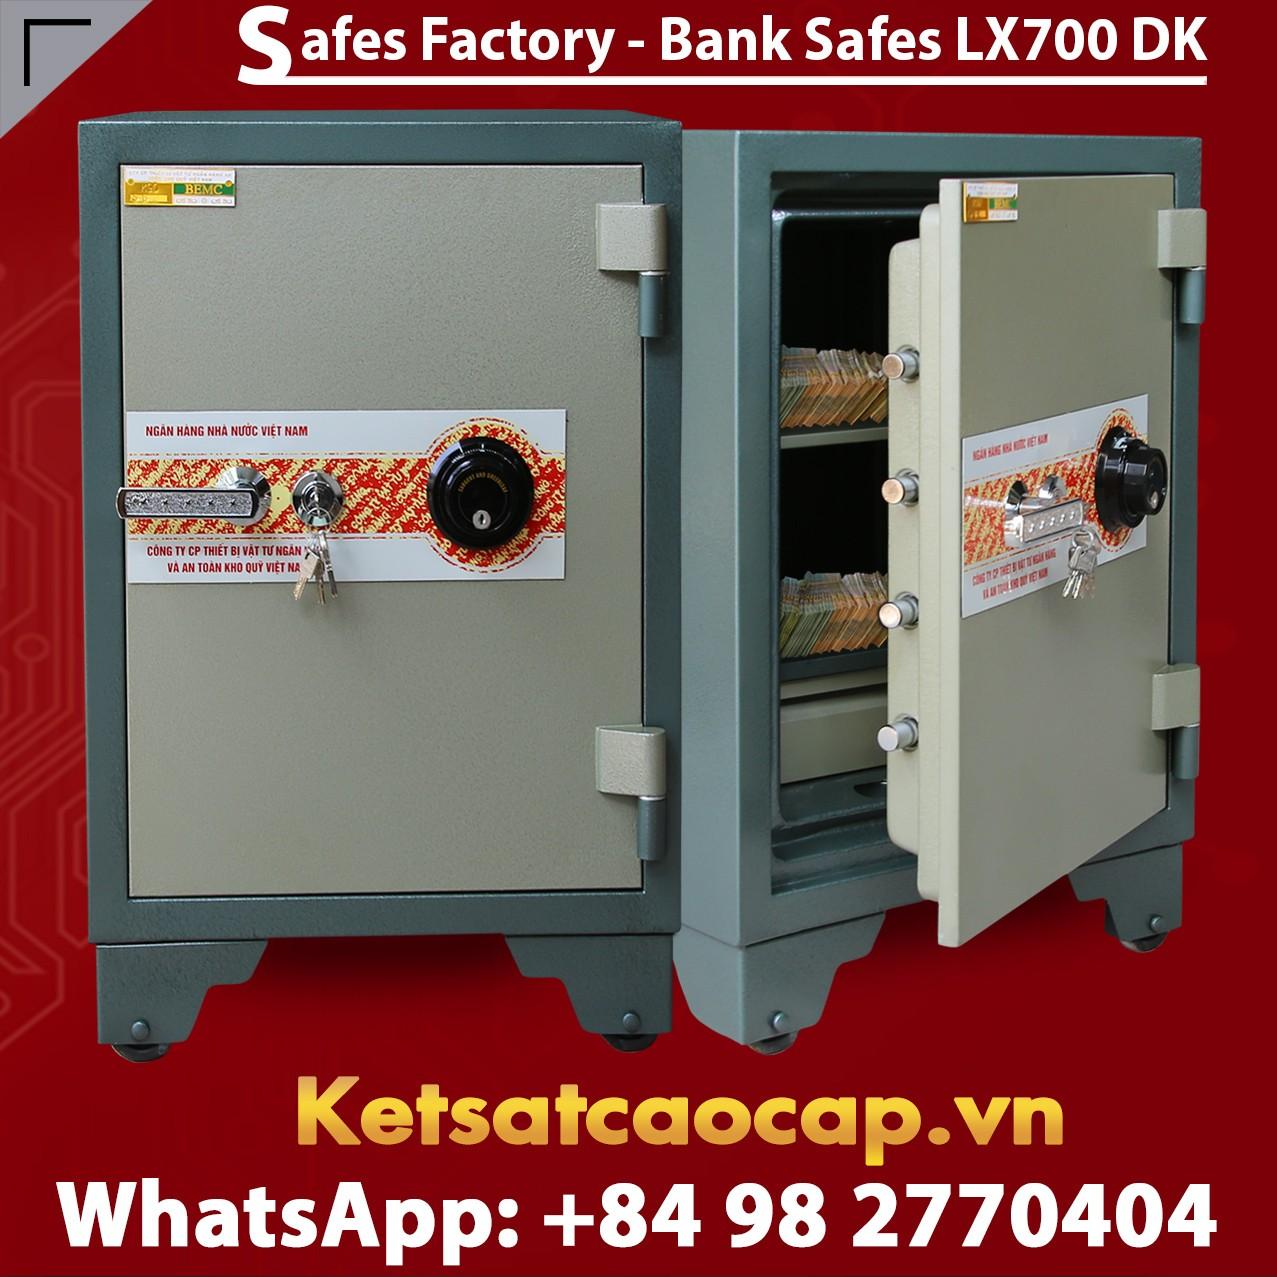 Bank Safes LX700 DK Luxurious Design High Quality Secure Bank Safe Box